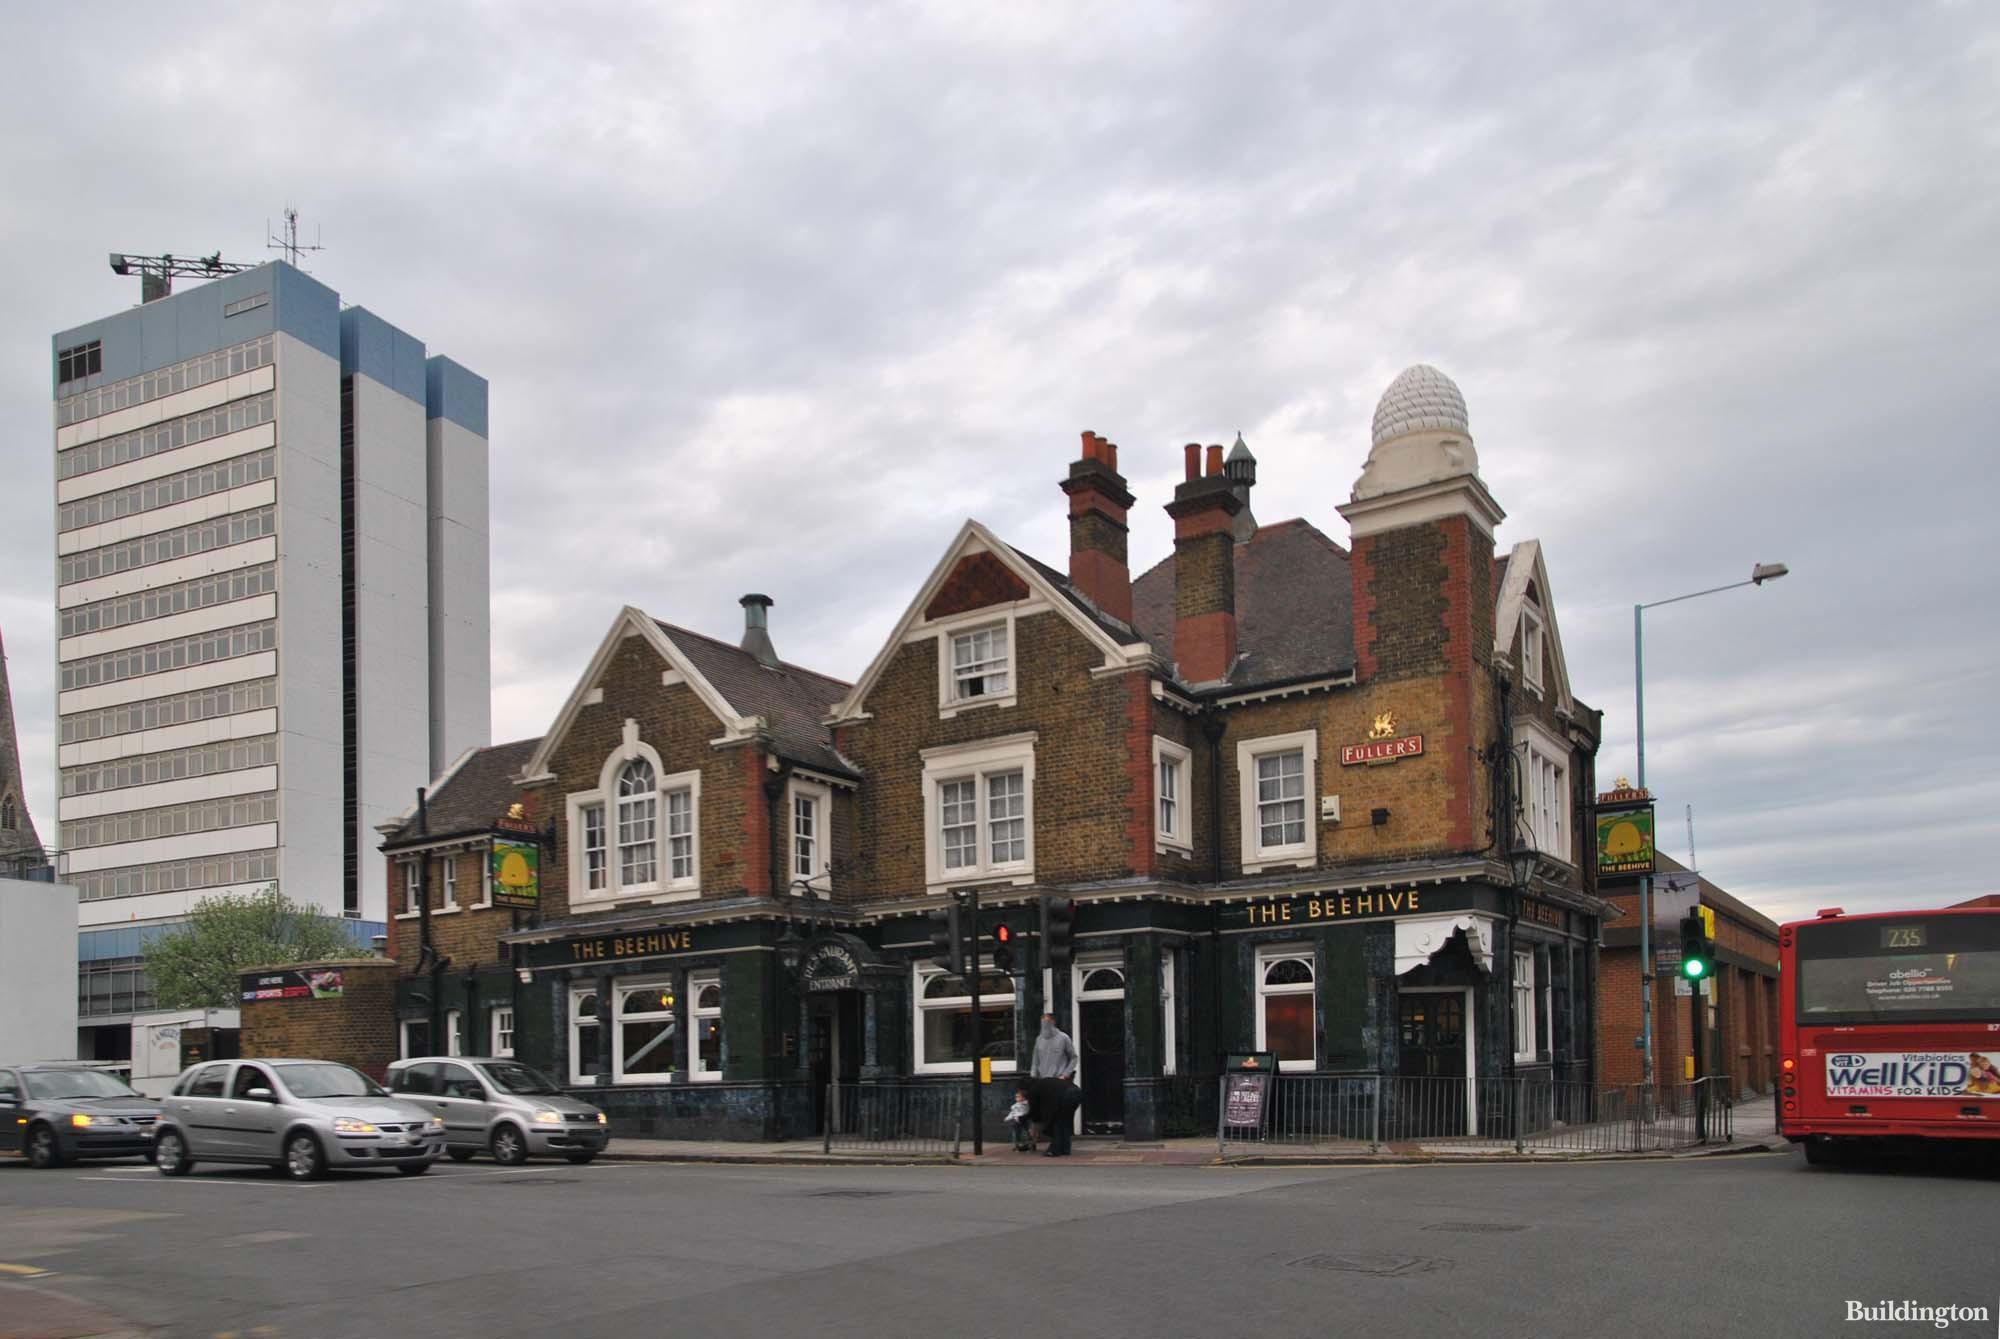 The Beehive pub building in Brentford, London TW8.